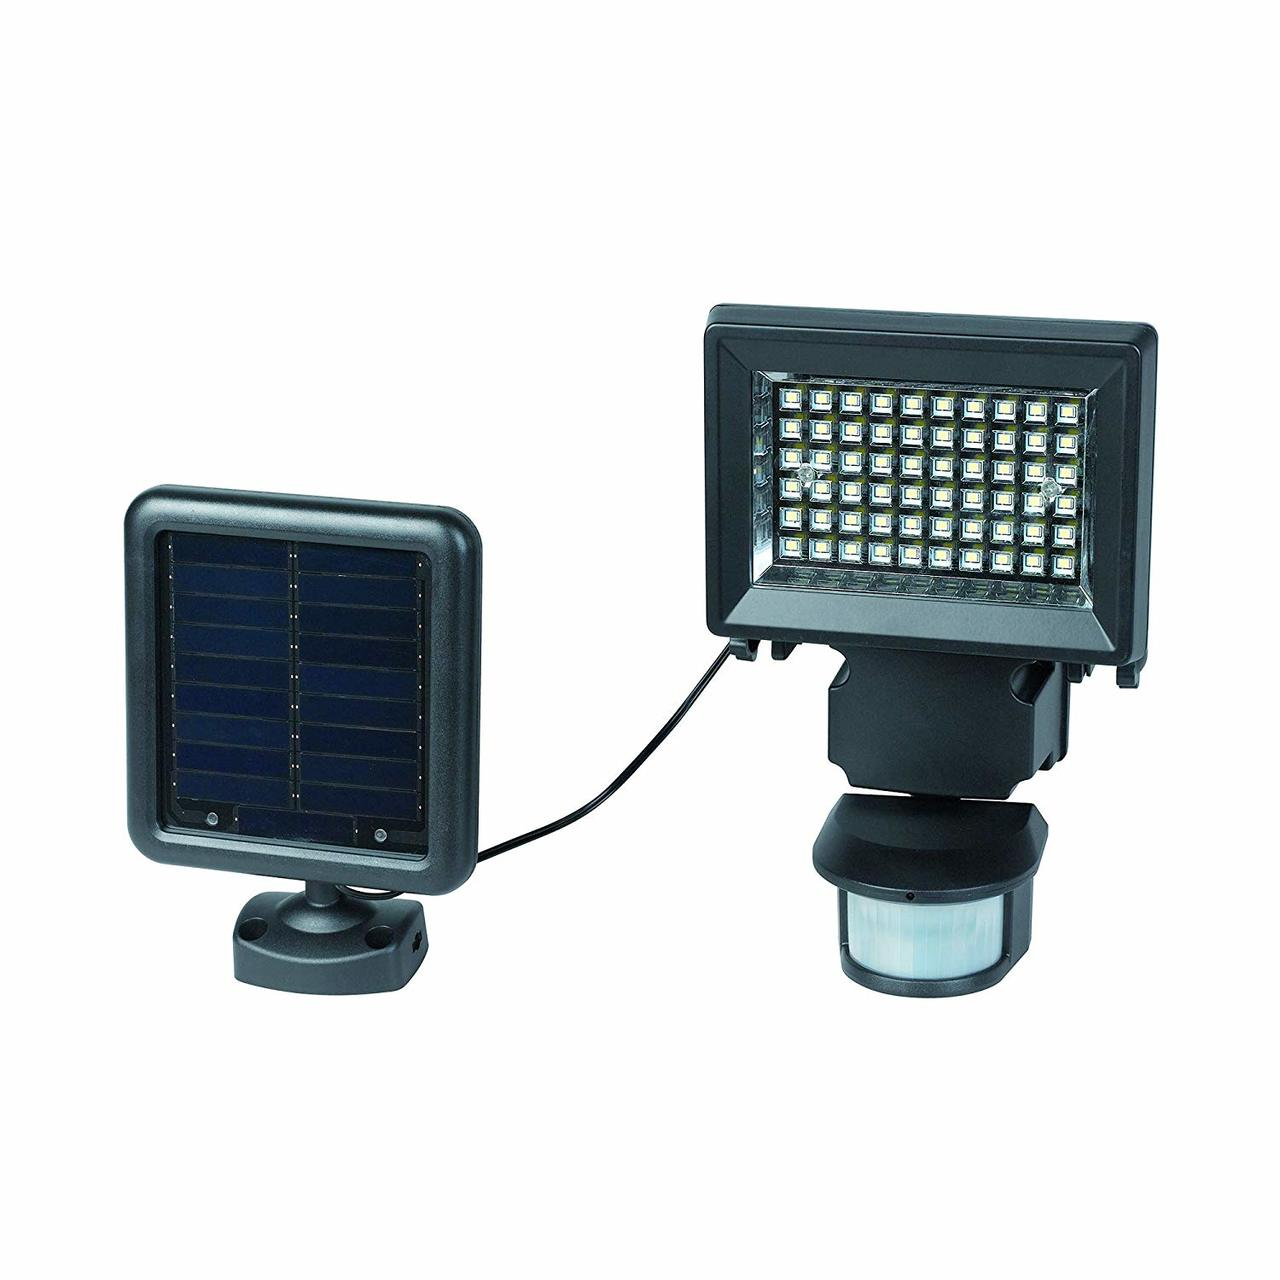 DURACELL SOLAR SECURITY LIGHT 400 LUMEN WITH MOTION SENSOR